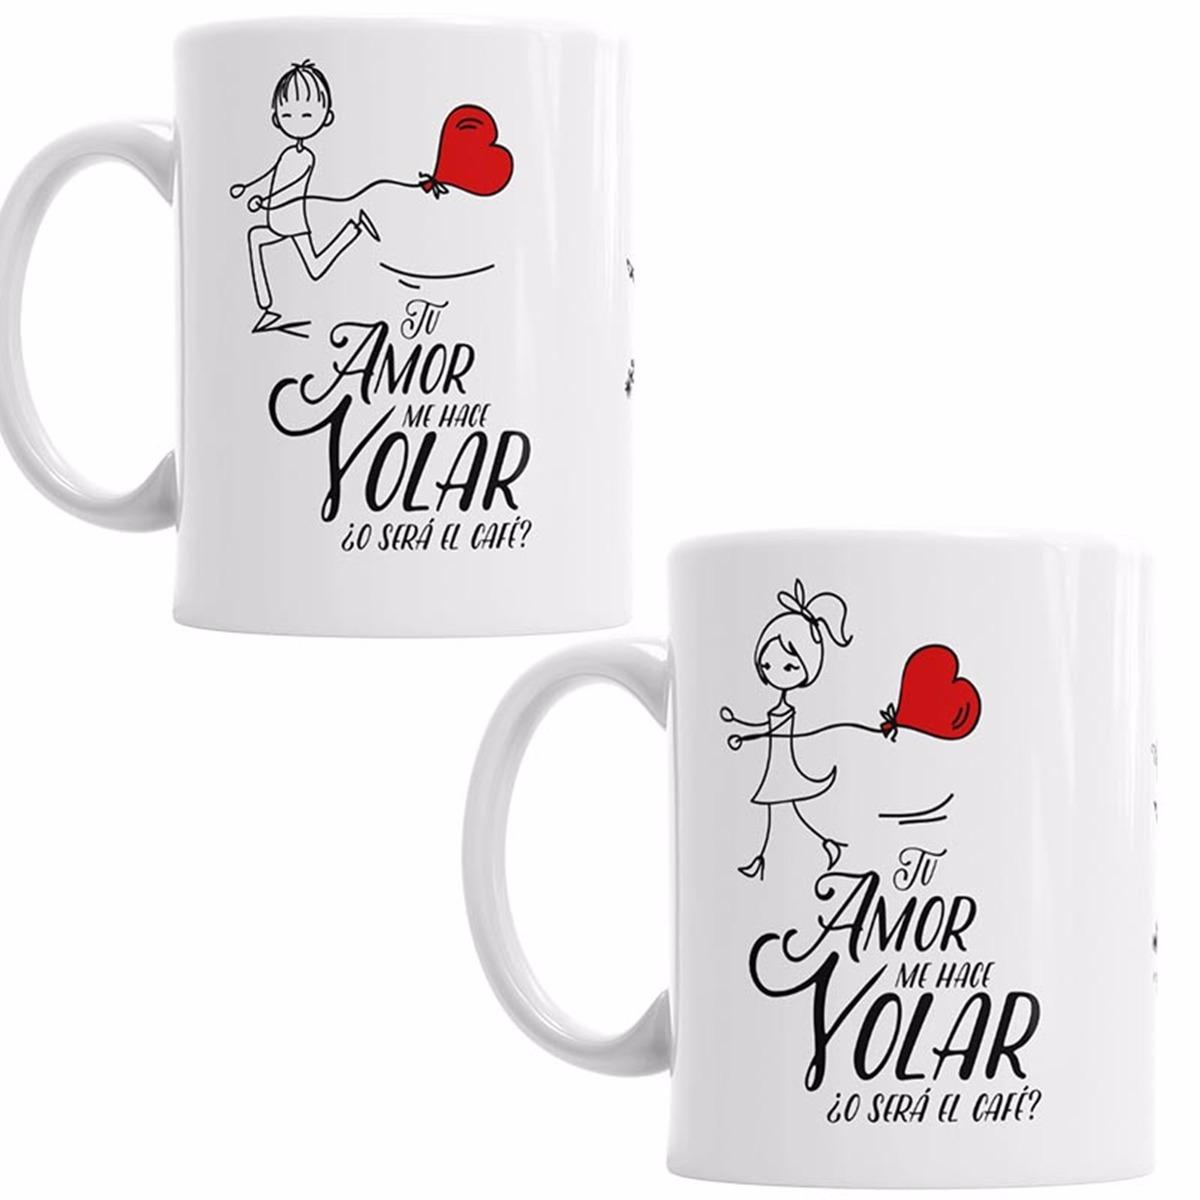 2 tazas de pareja para novios boda aniversario regalo 3 for Regalos novios boda